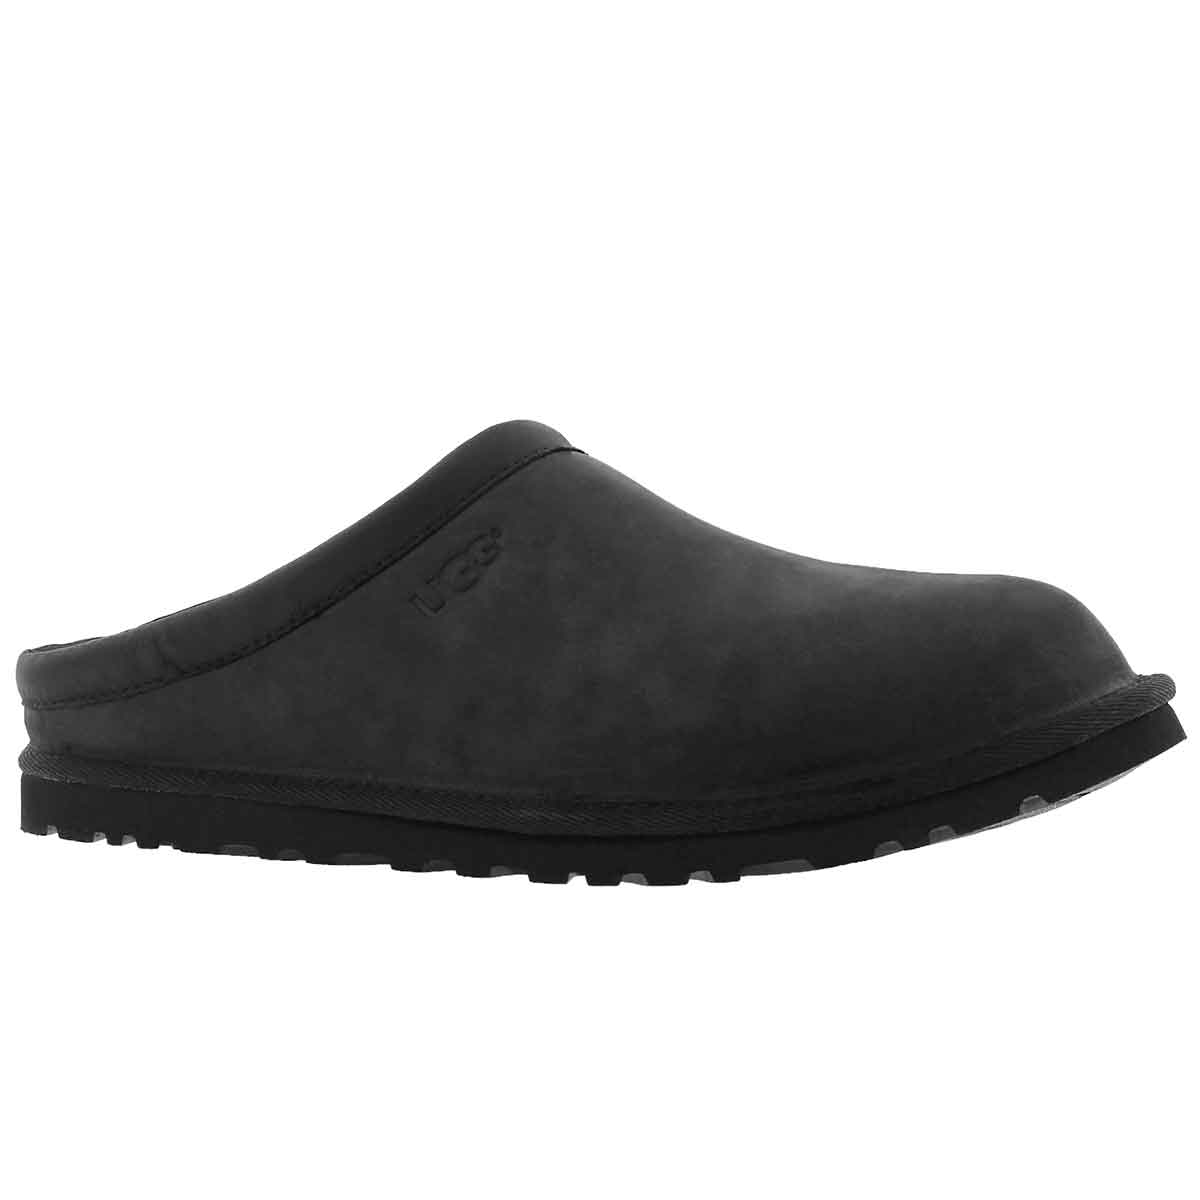 Men's CLASSIC black casual clogs